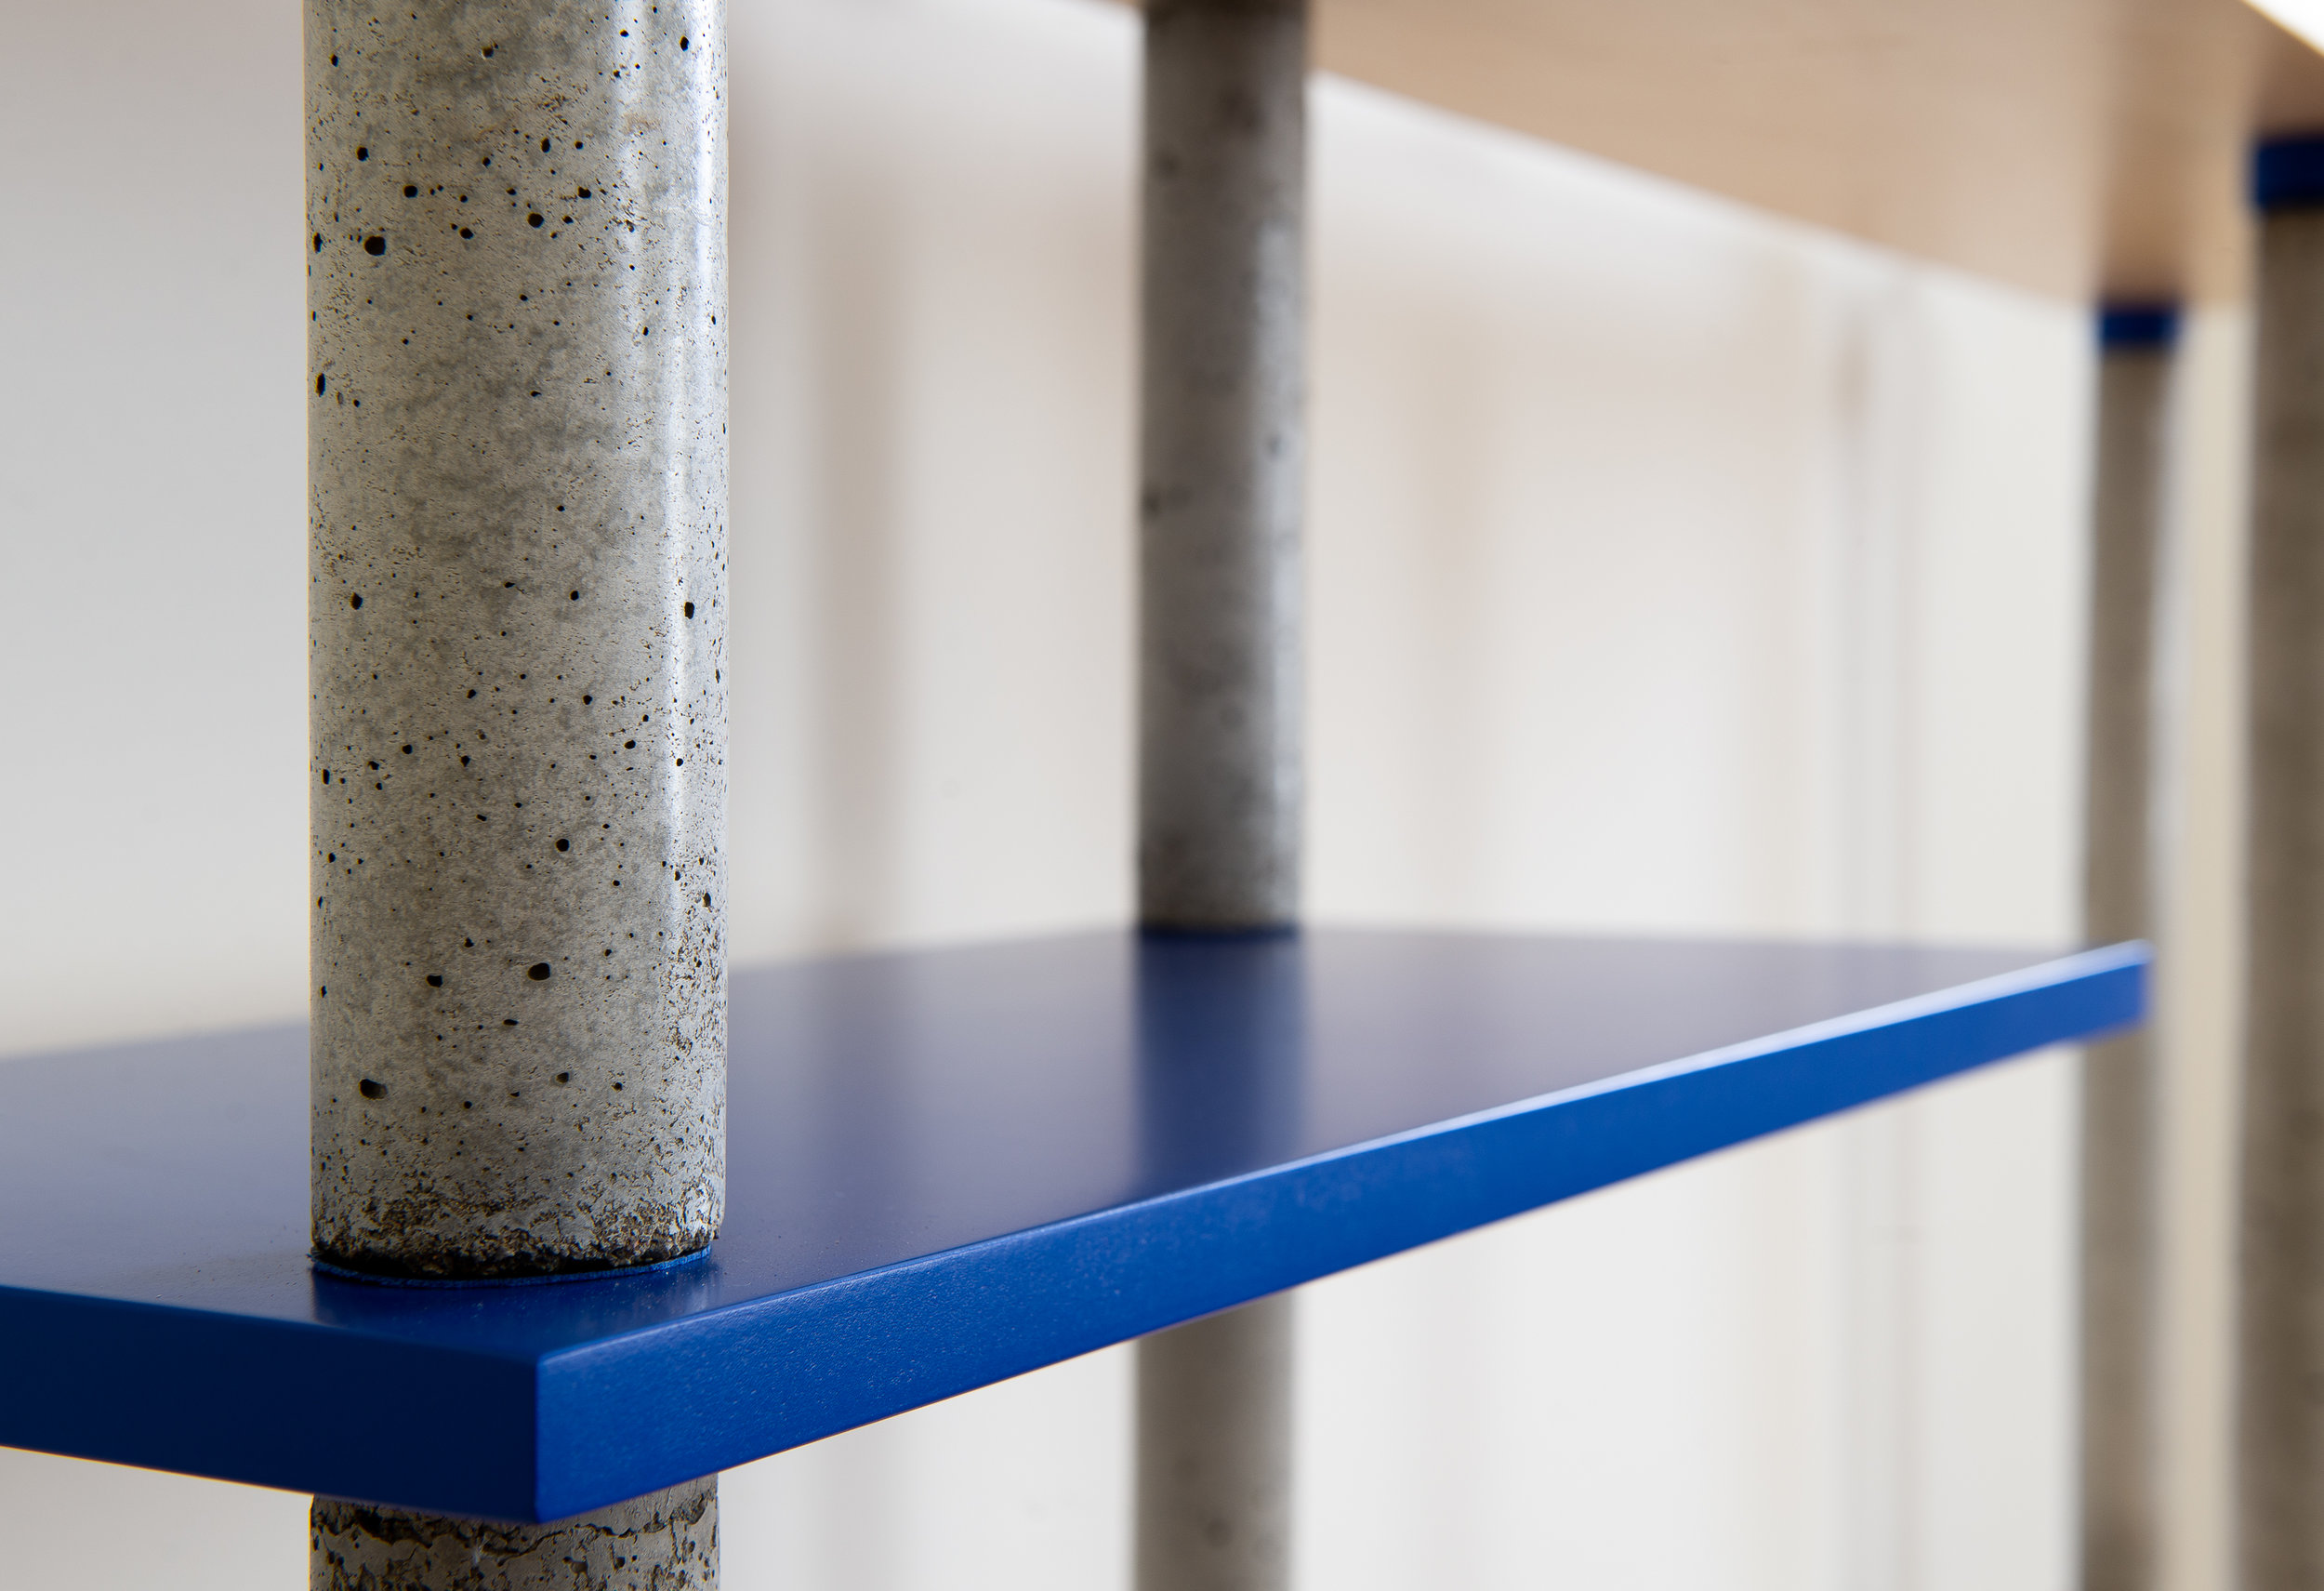 Concrete bookcase pillars with cobalt blue shelf